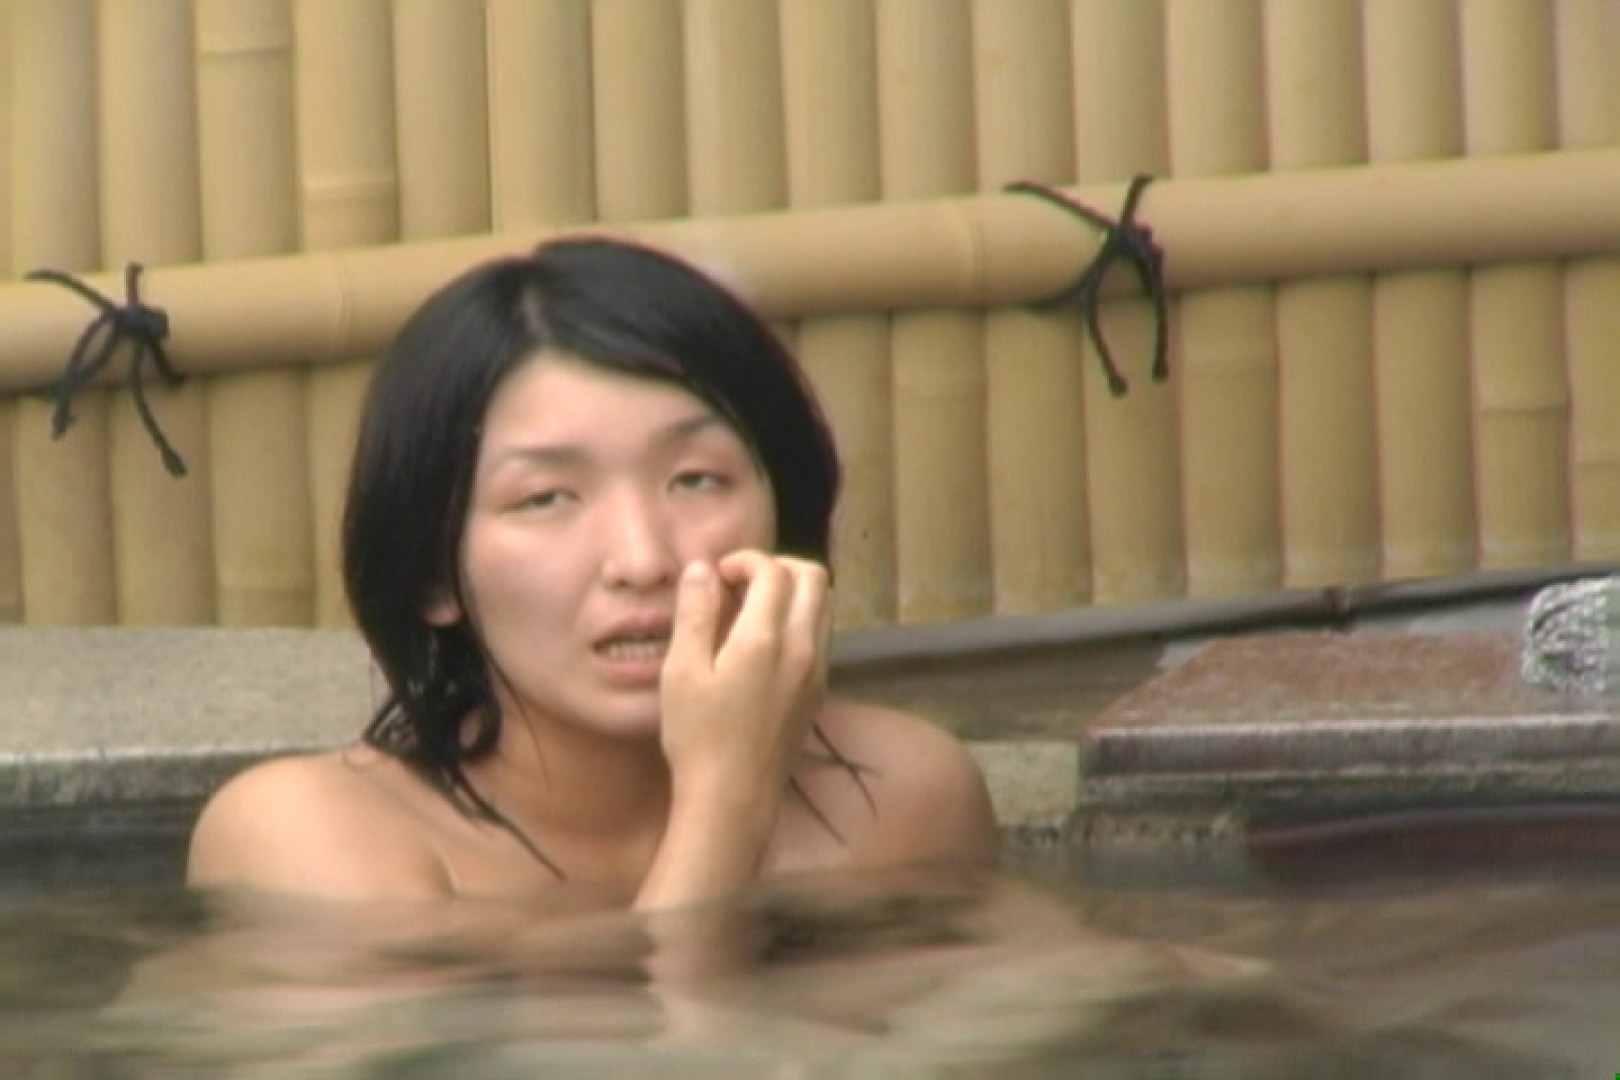 Aquaな露天風呂Vol.618 盗撮映像  104Pix 75